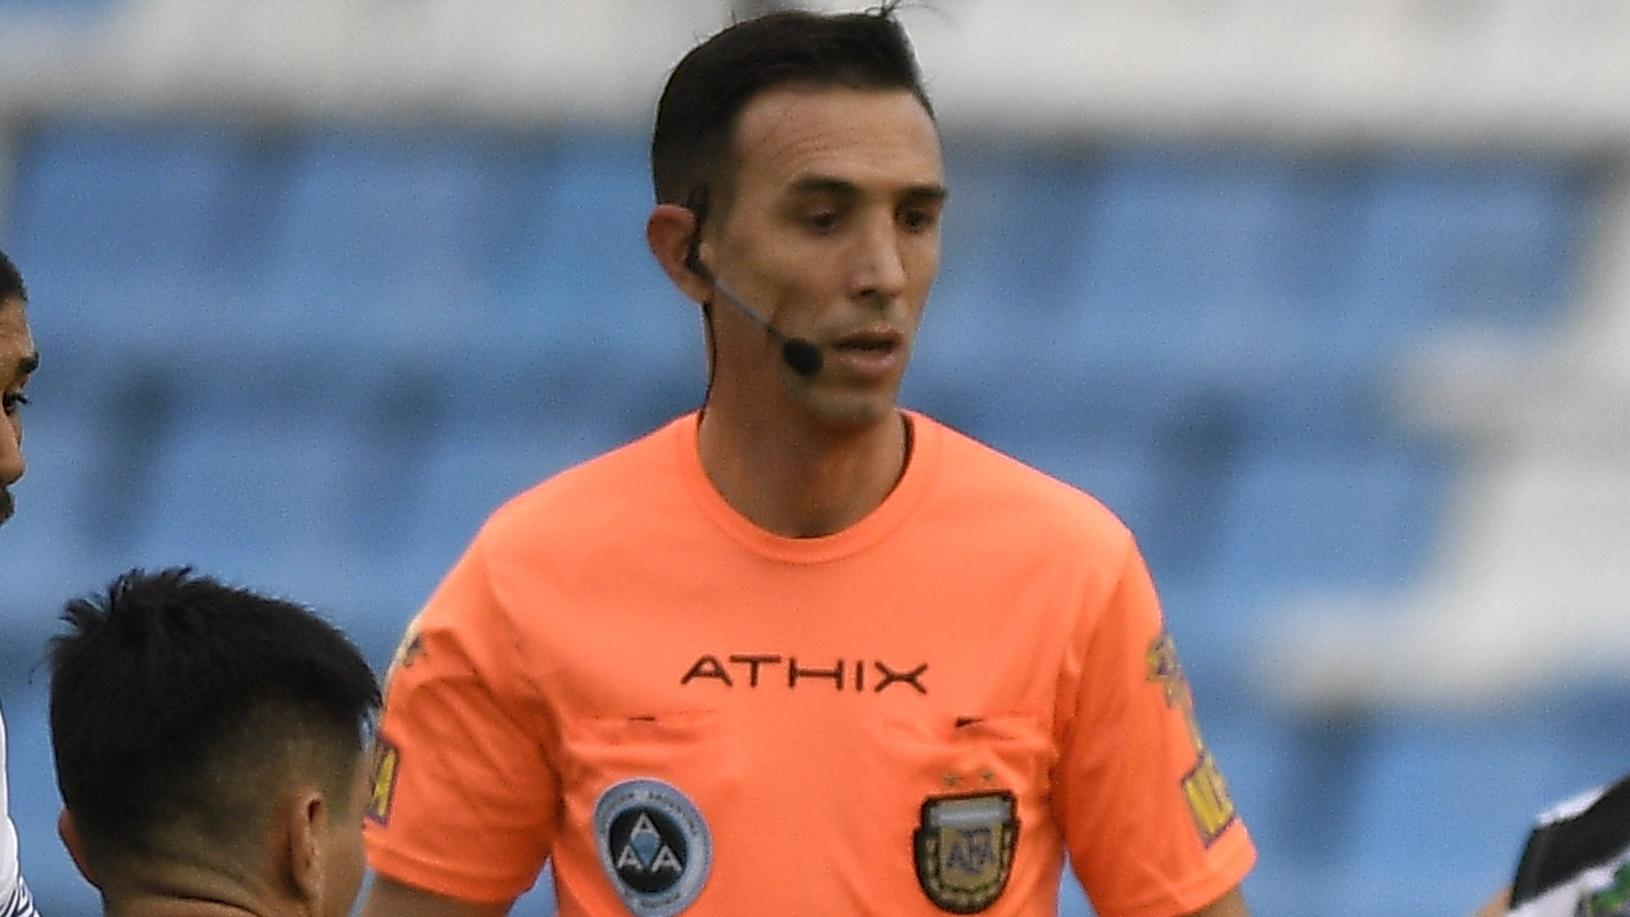 Dóvalo, será el árbitro / Vélez Sarsfield